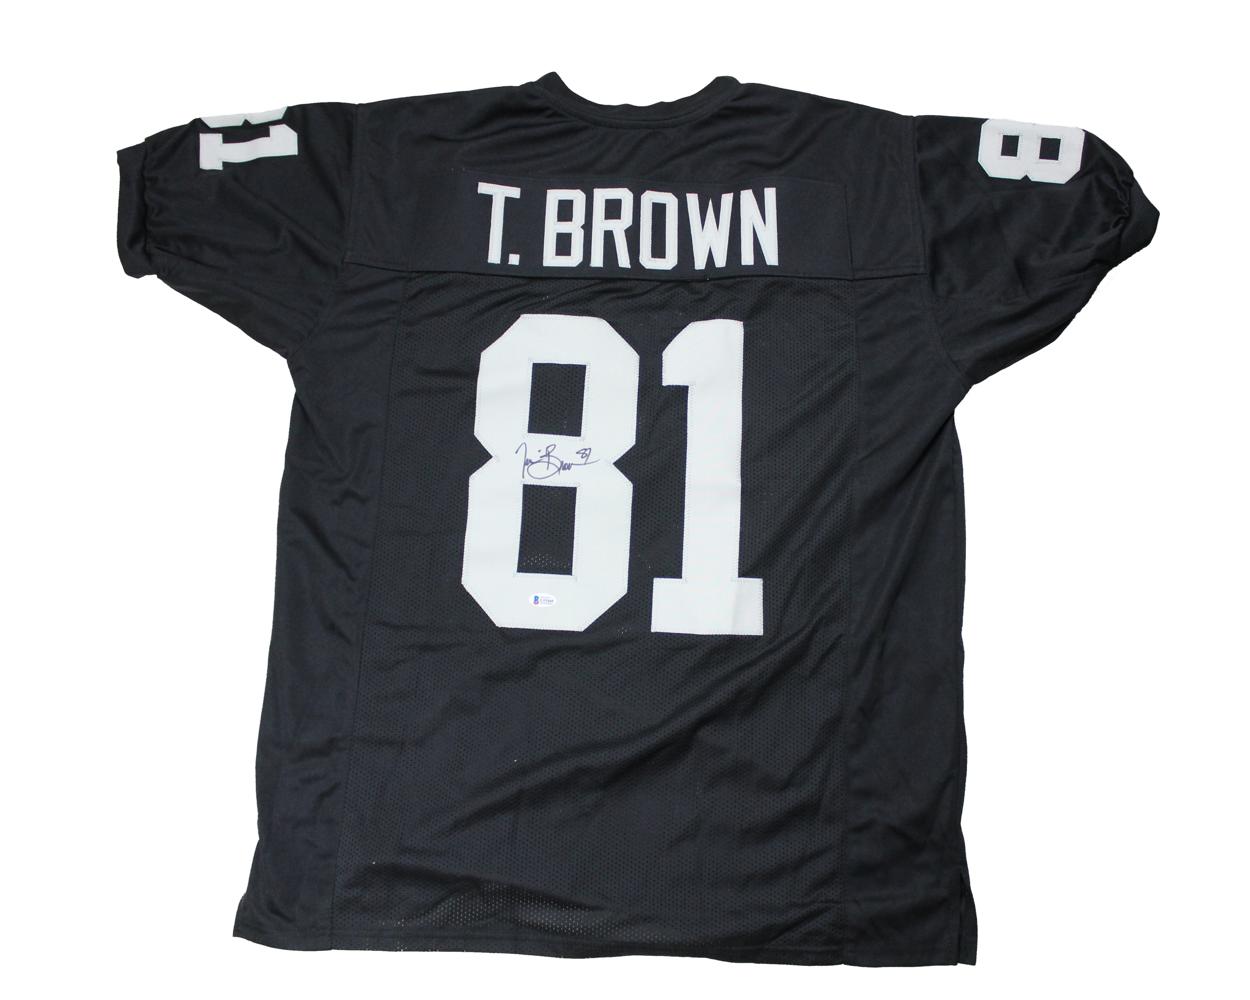 hot sale online 7bdcf b25a1 Tim Brown Autographed Custom Oakland Raiders Jersey